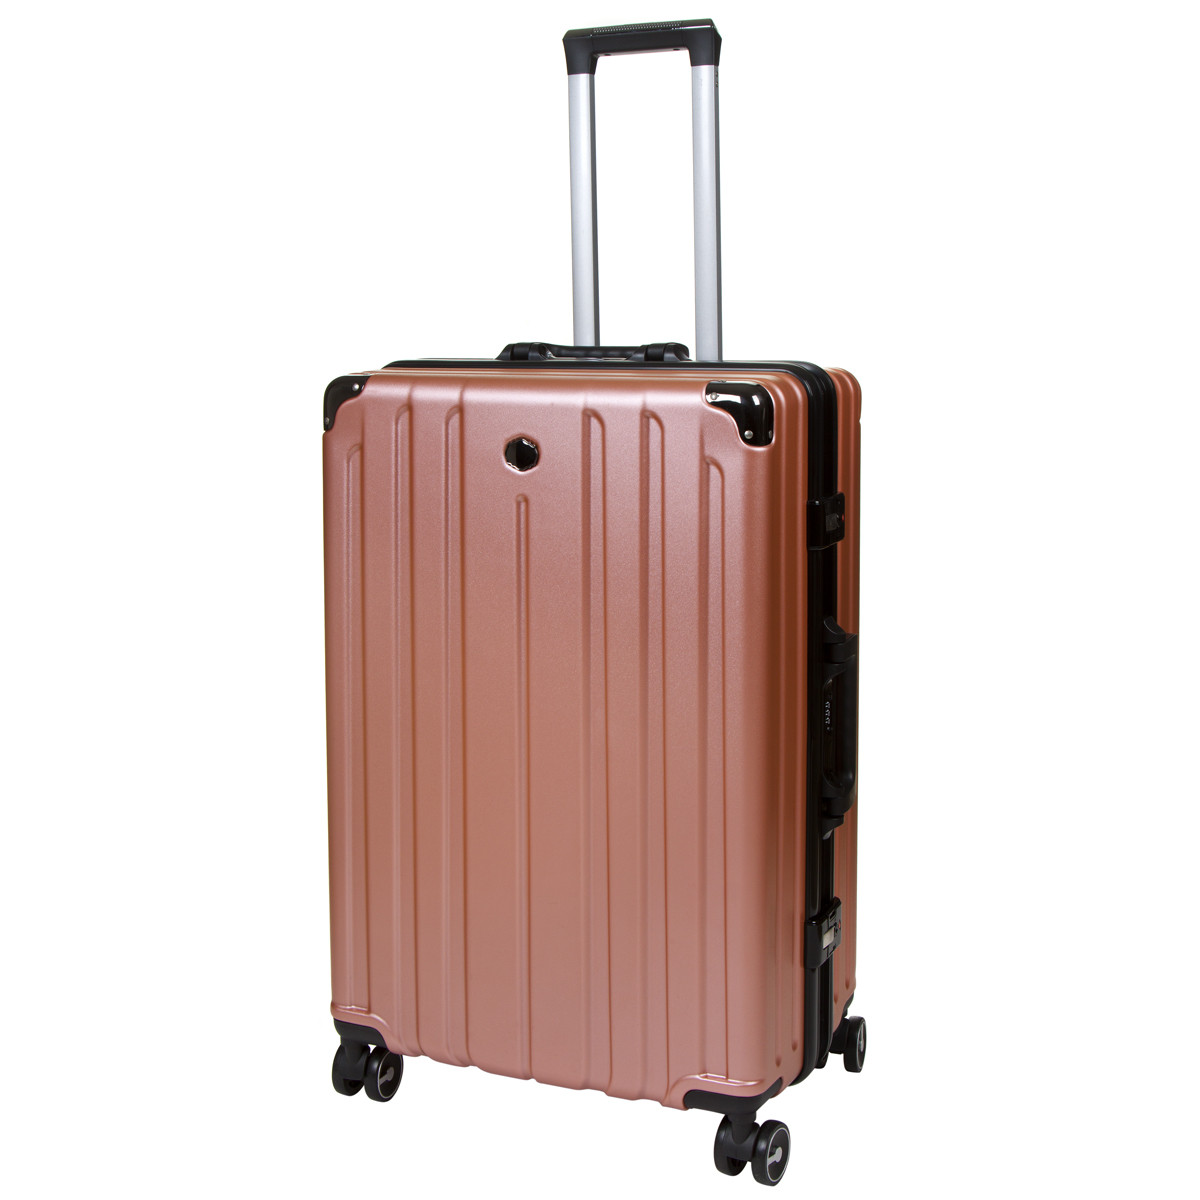 Чемодан большой пластик ABS розовый OUPAI алюминиевый каркас   кс1106-1розб